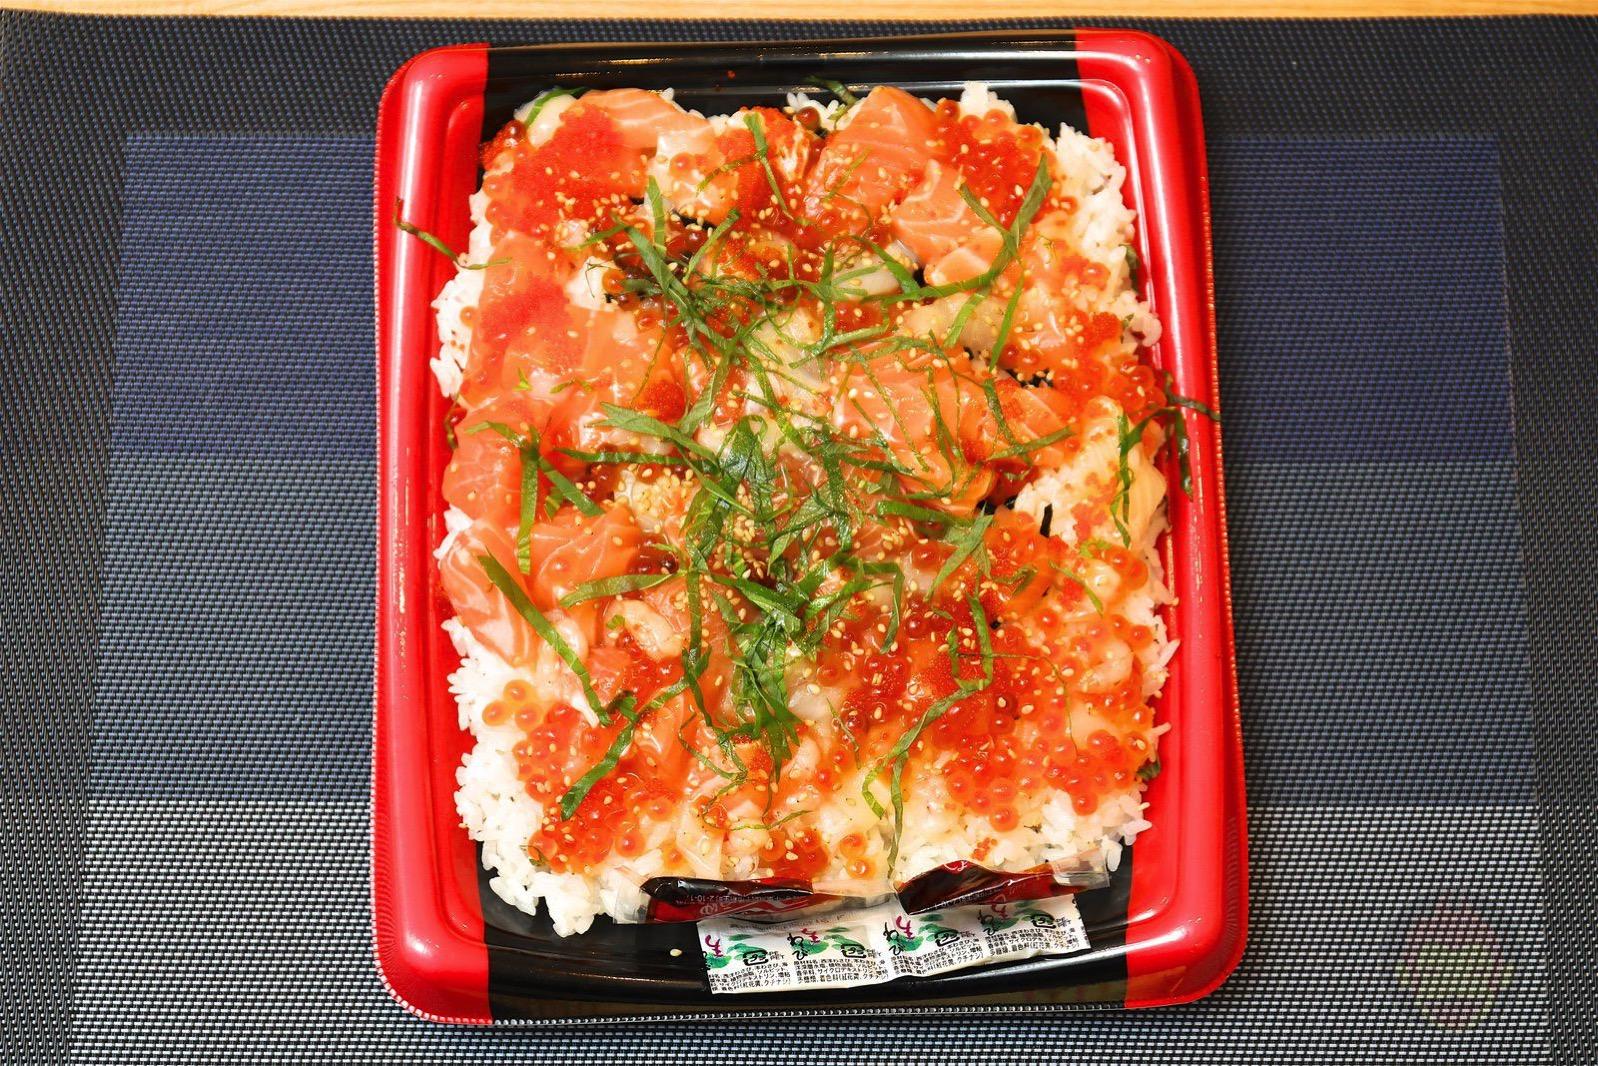 Costco Chirashi Sushi Platter 01